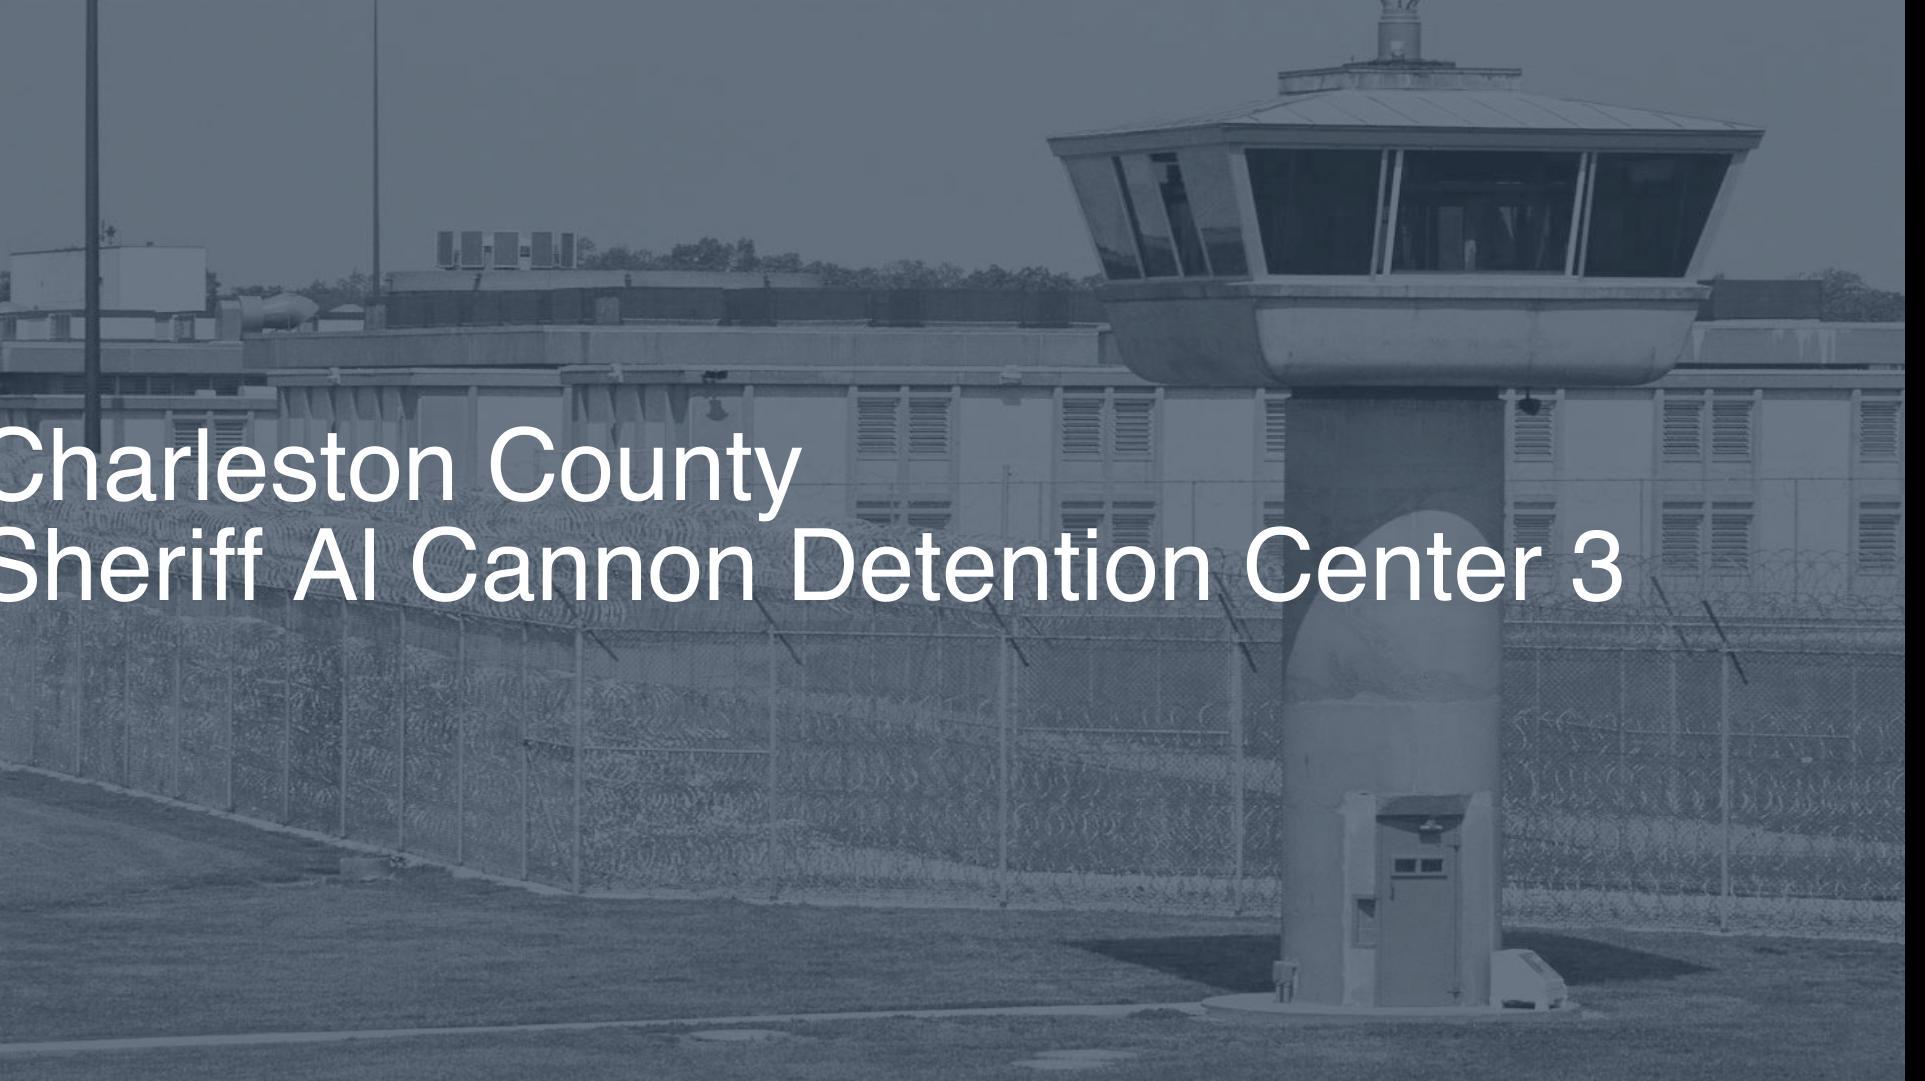 Charleston County – Sheriff Al Cannon Detention Center